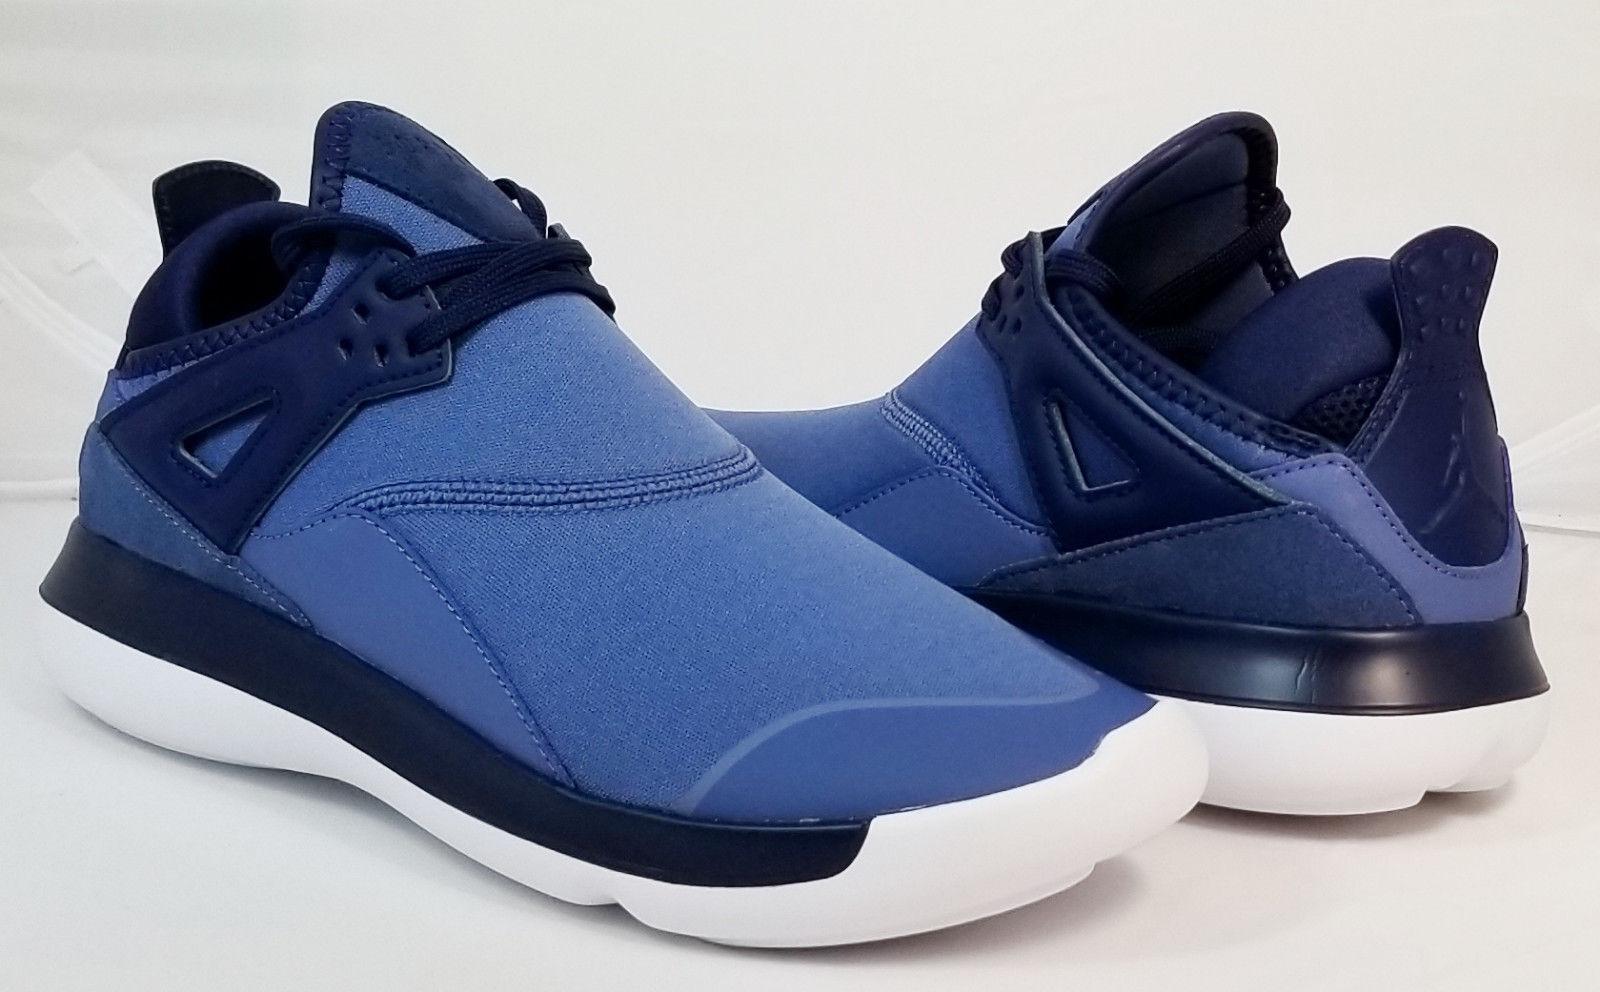 NIKE HUARACHE Boys RUN (GS) Sneakers 654275 022 MSRP: $85